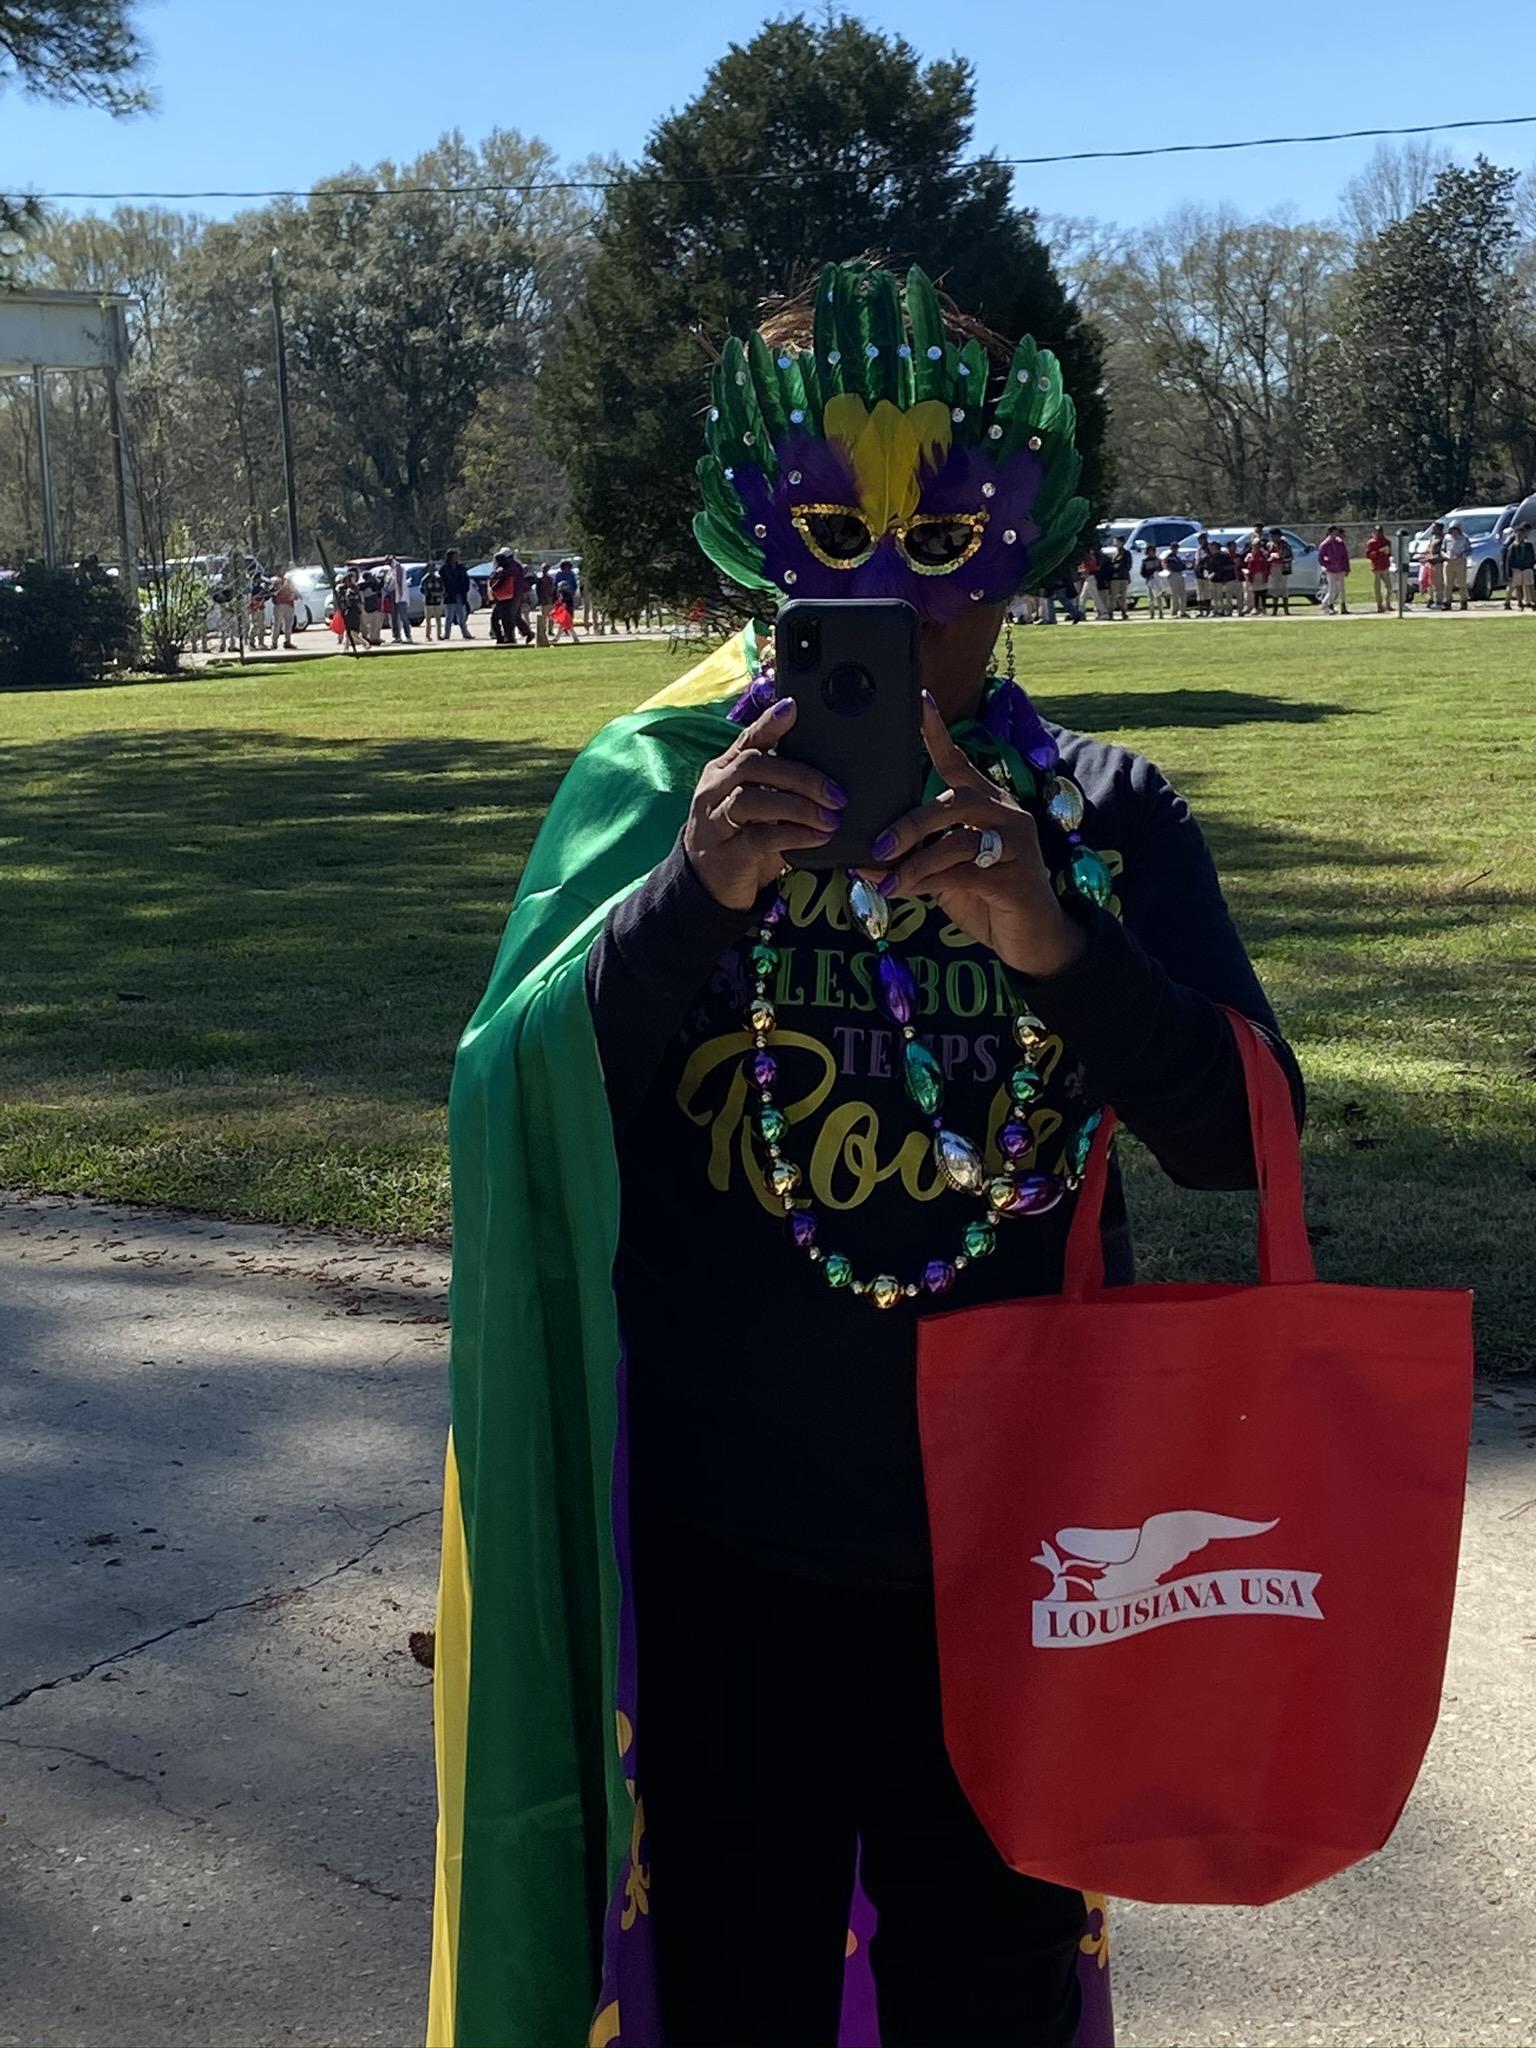 Photo Dr. Domingue took of PRAMS Mardi Graw Parade